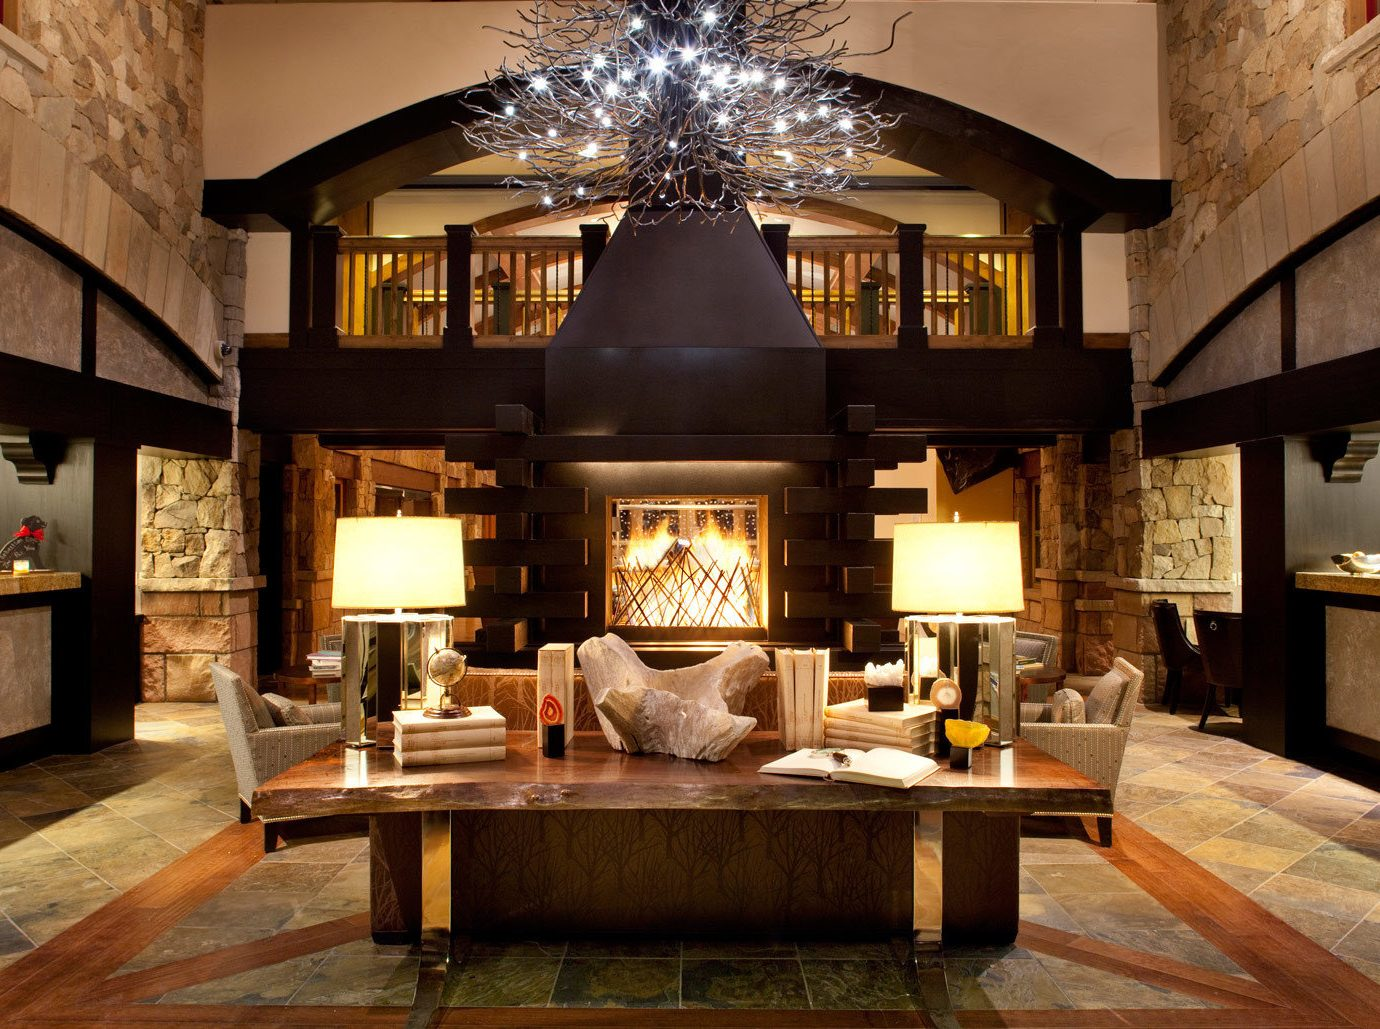 Hotels indoor floor living room room property estate home house interior design mansion Lobby wood Design ceiling Fireplace Villa farmhouse